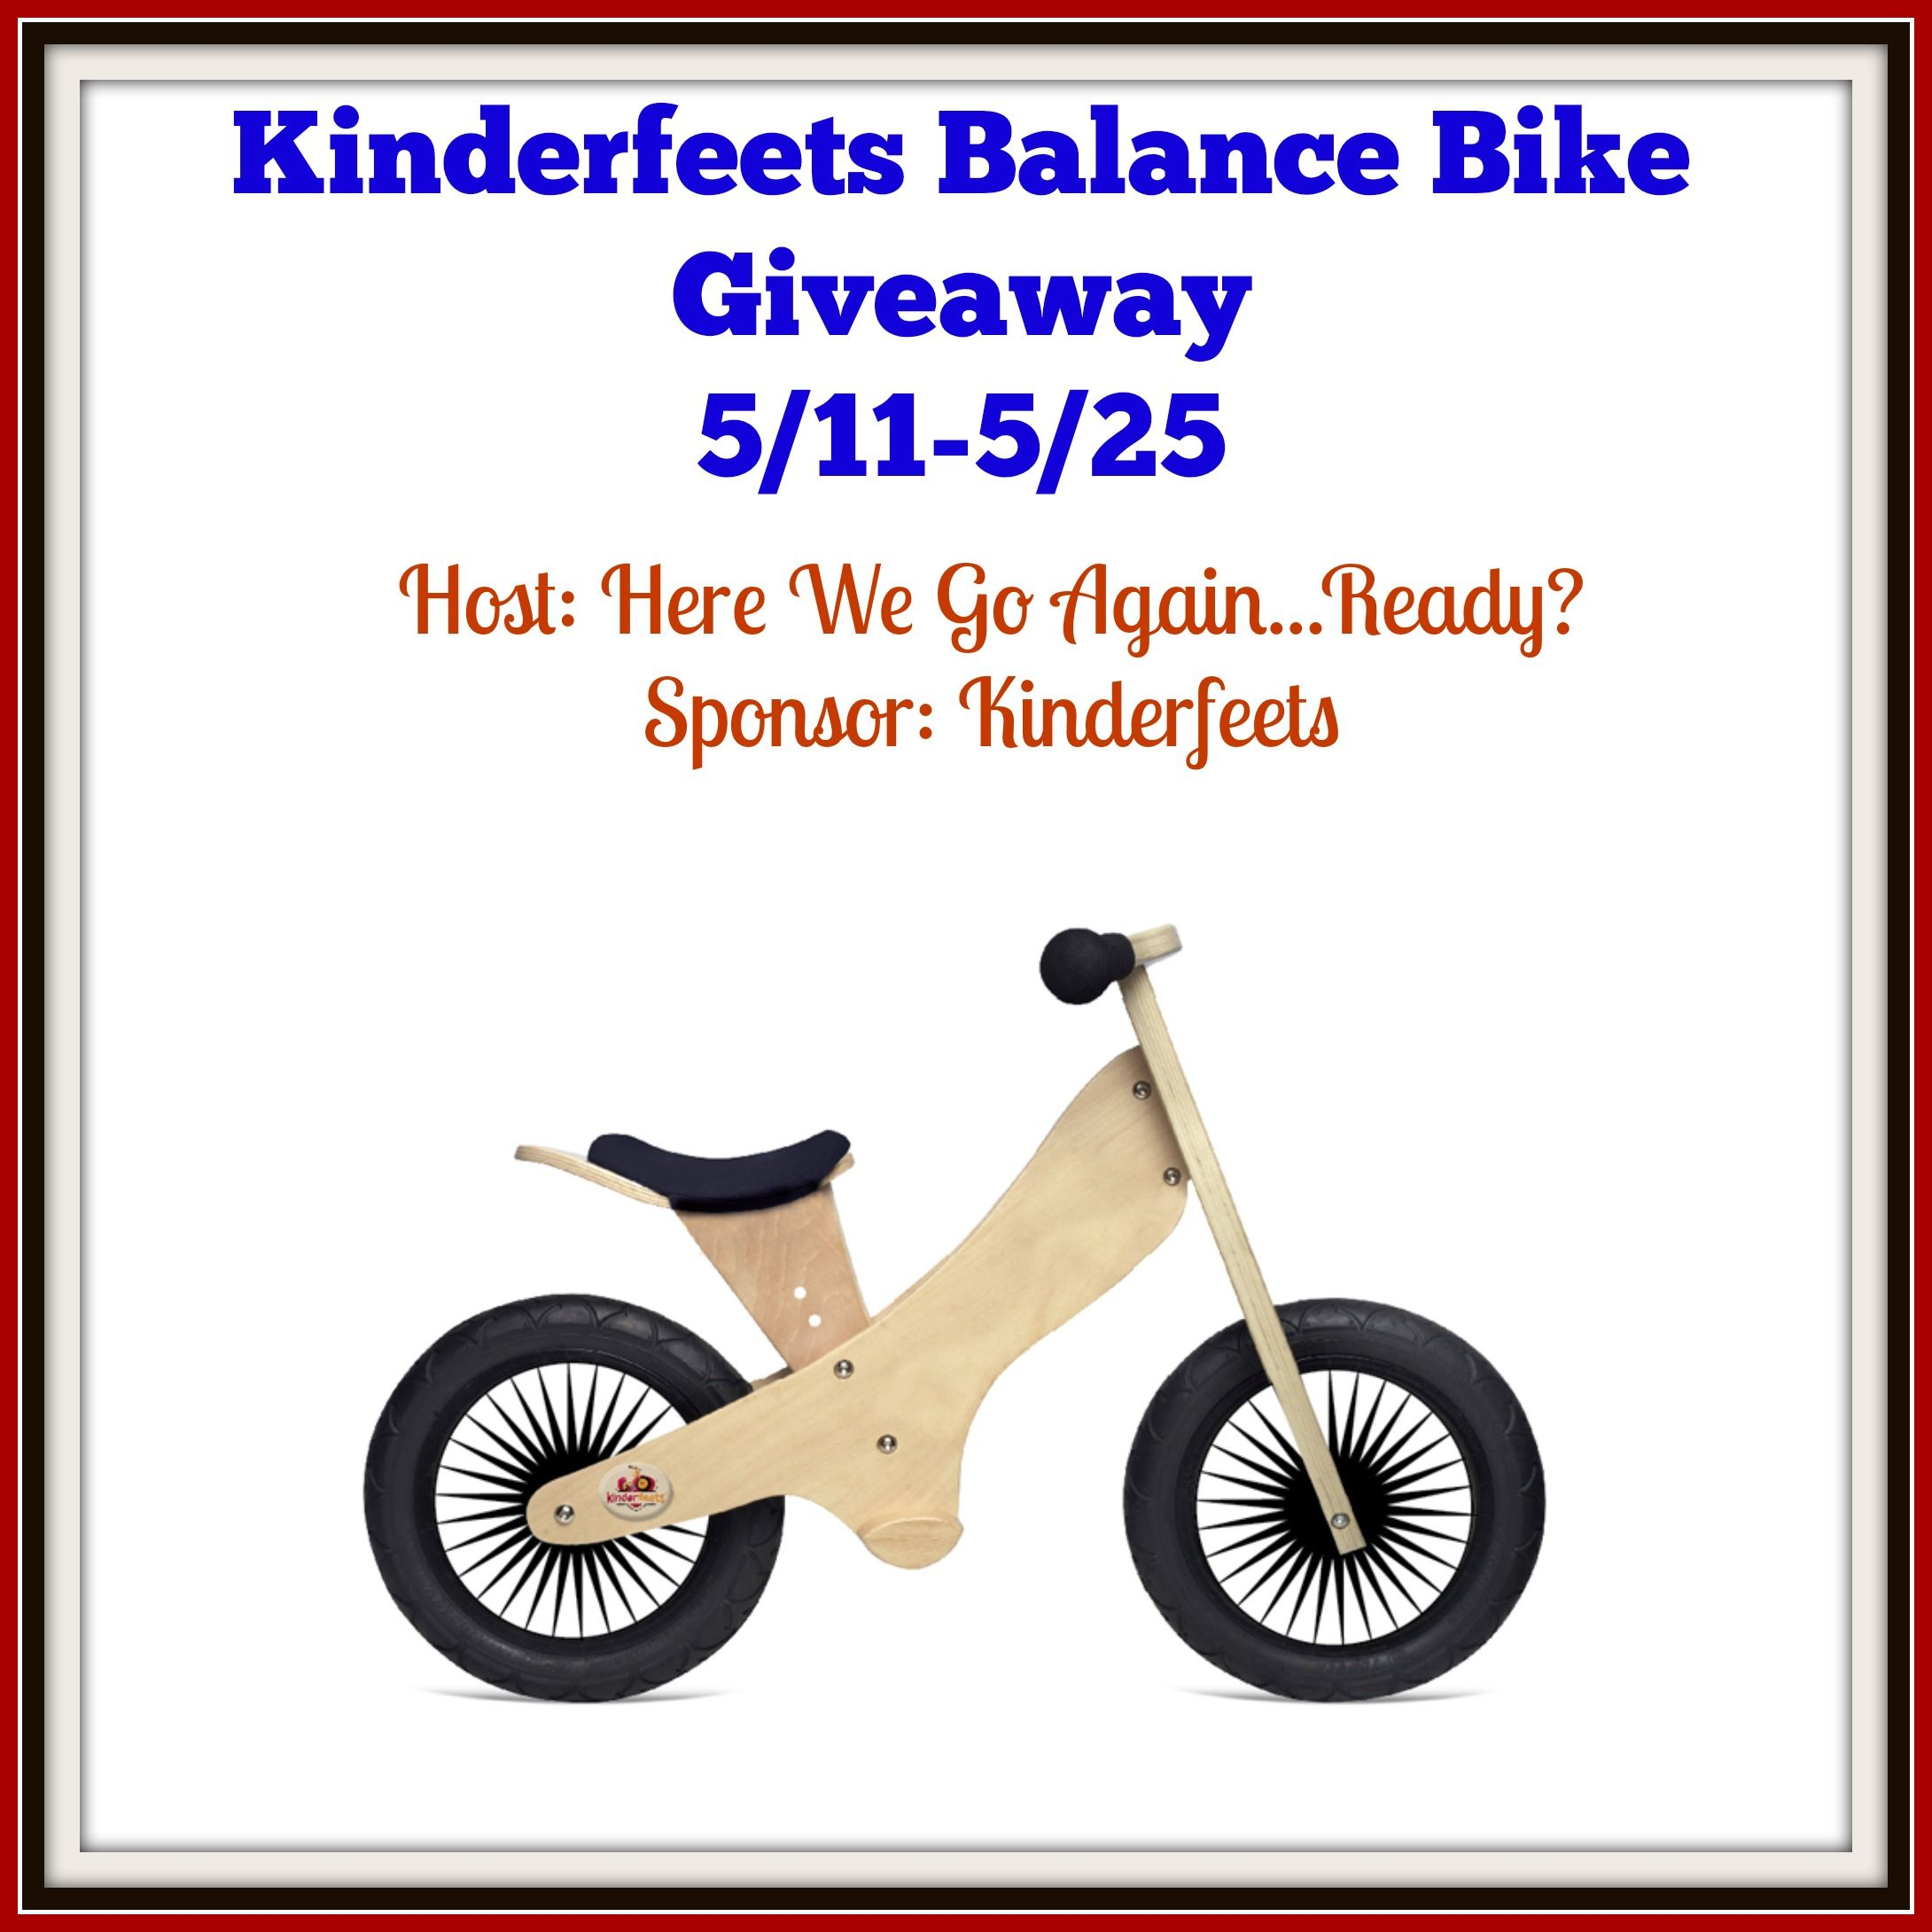 Kinderfeets Retro Balance Bike Giveaway Ends 5 25 Kinderfeets Balance Bike Giveaway Sweepstakes